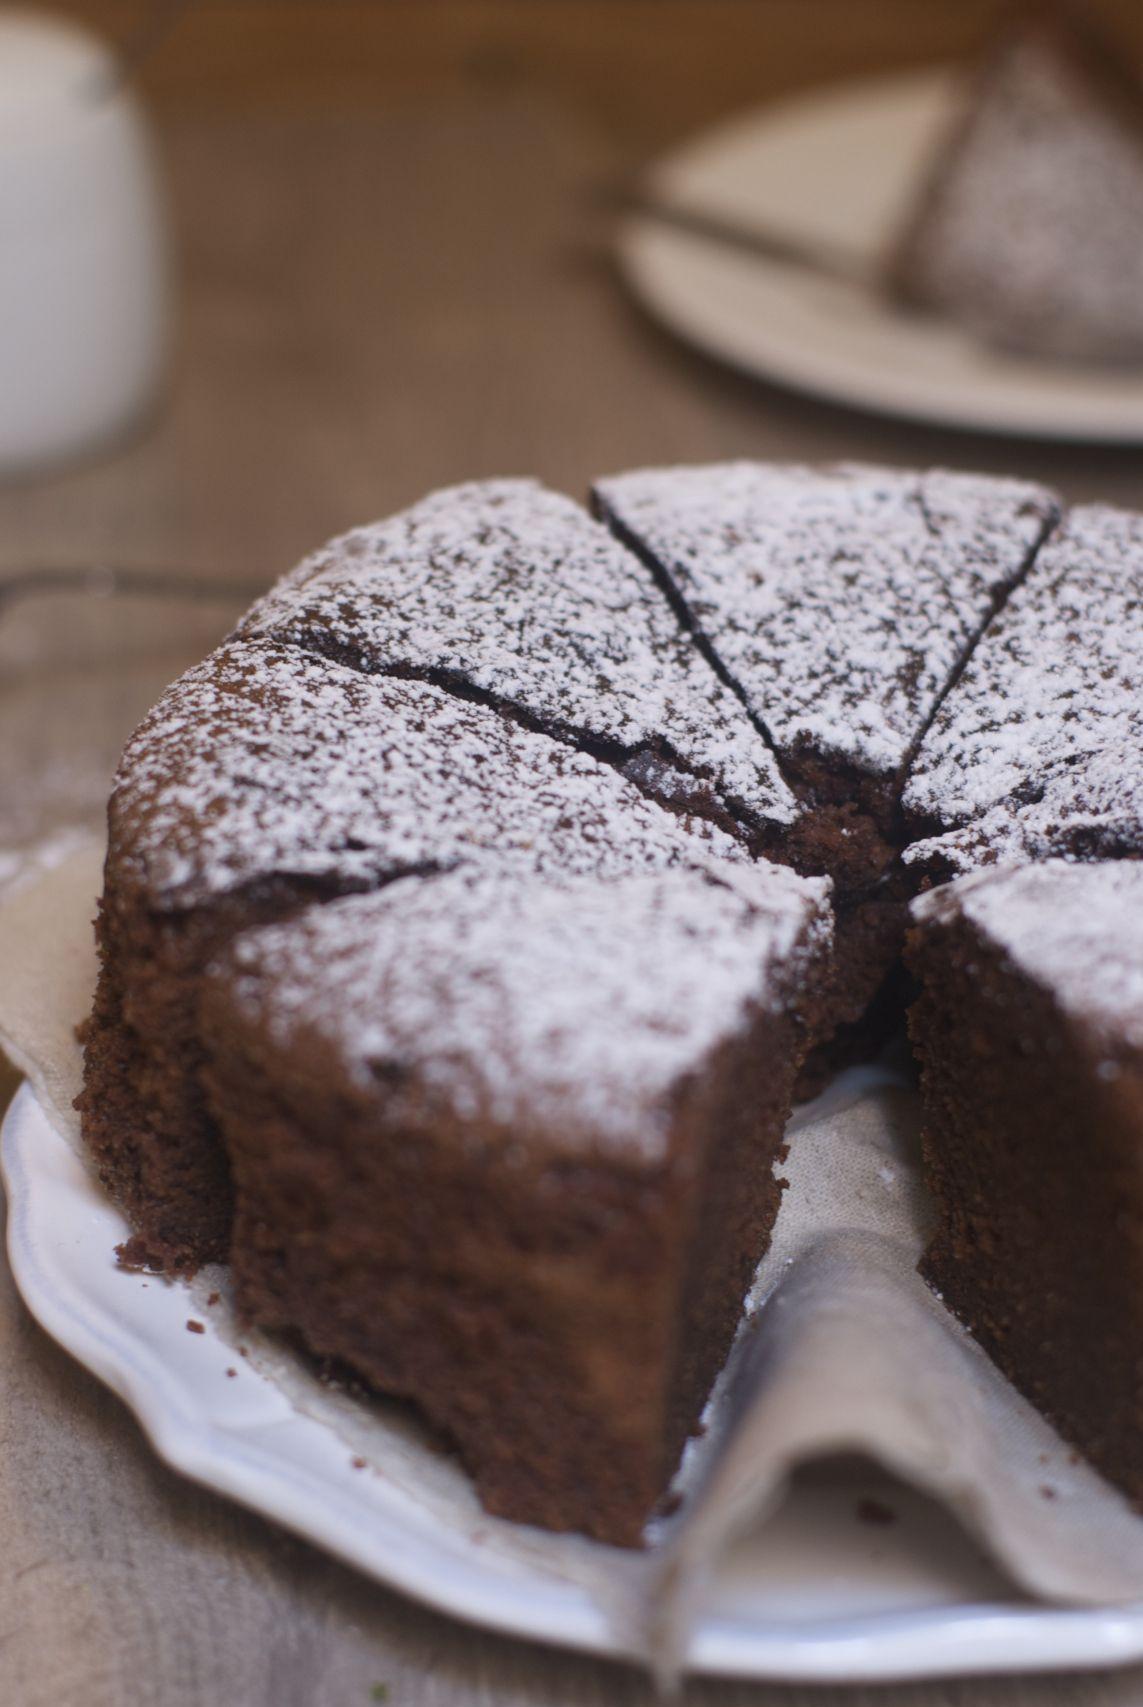 Le gâteau au chocolat de ma grandmère